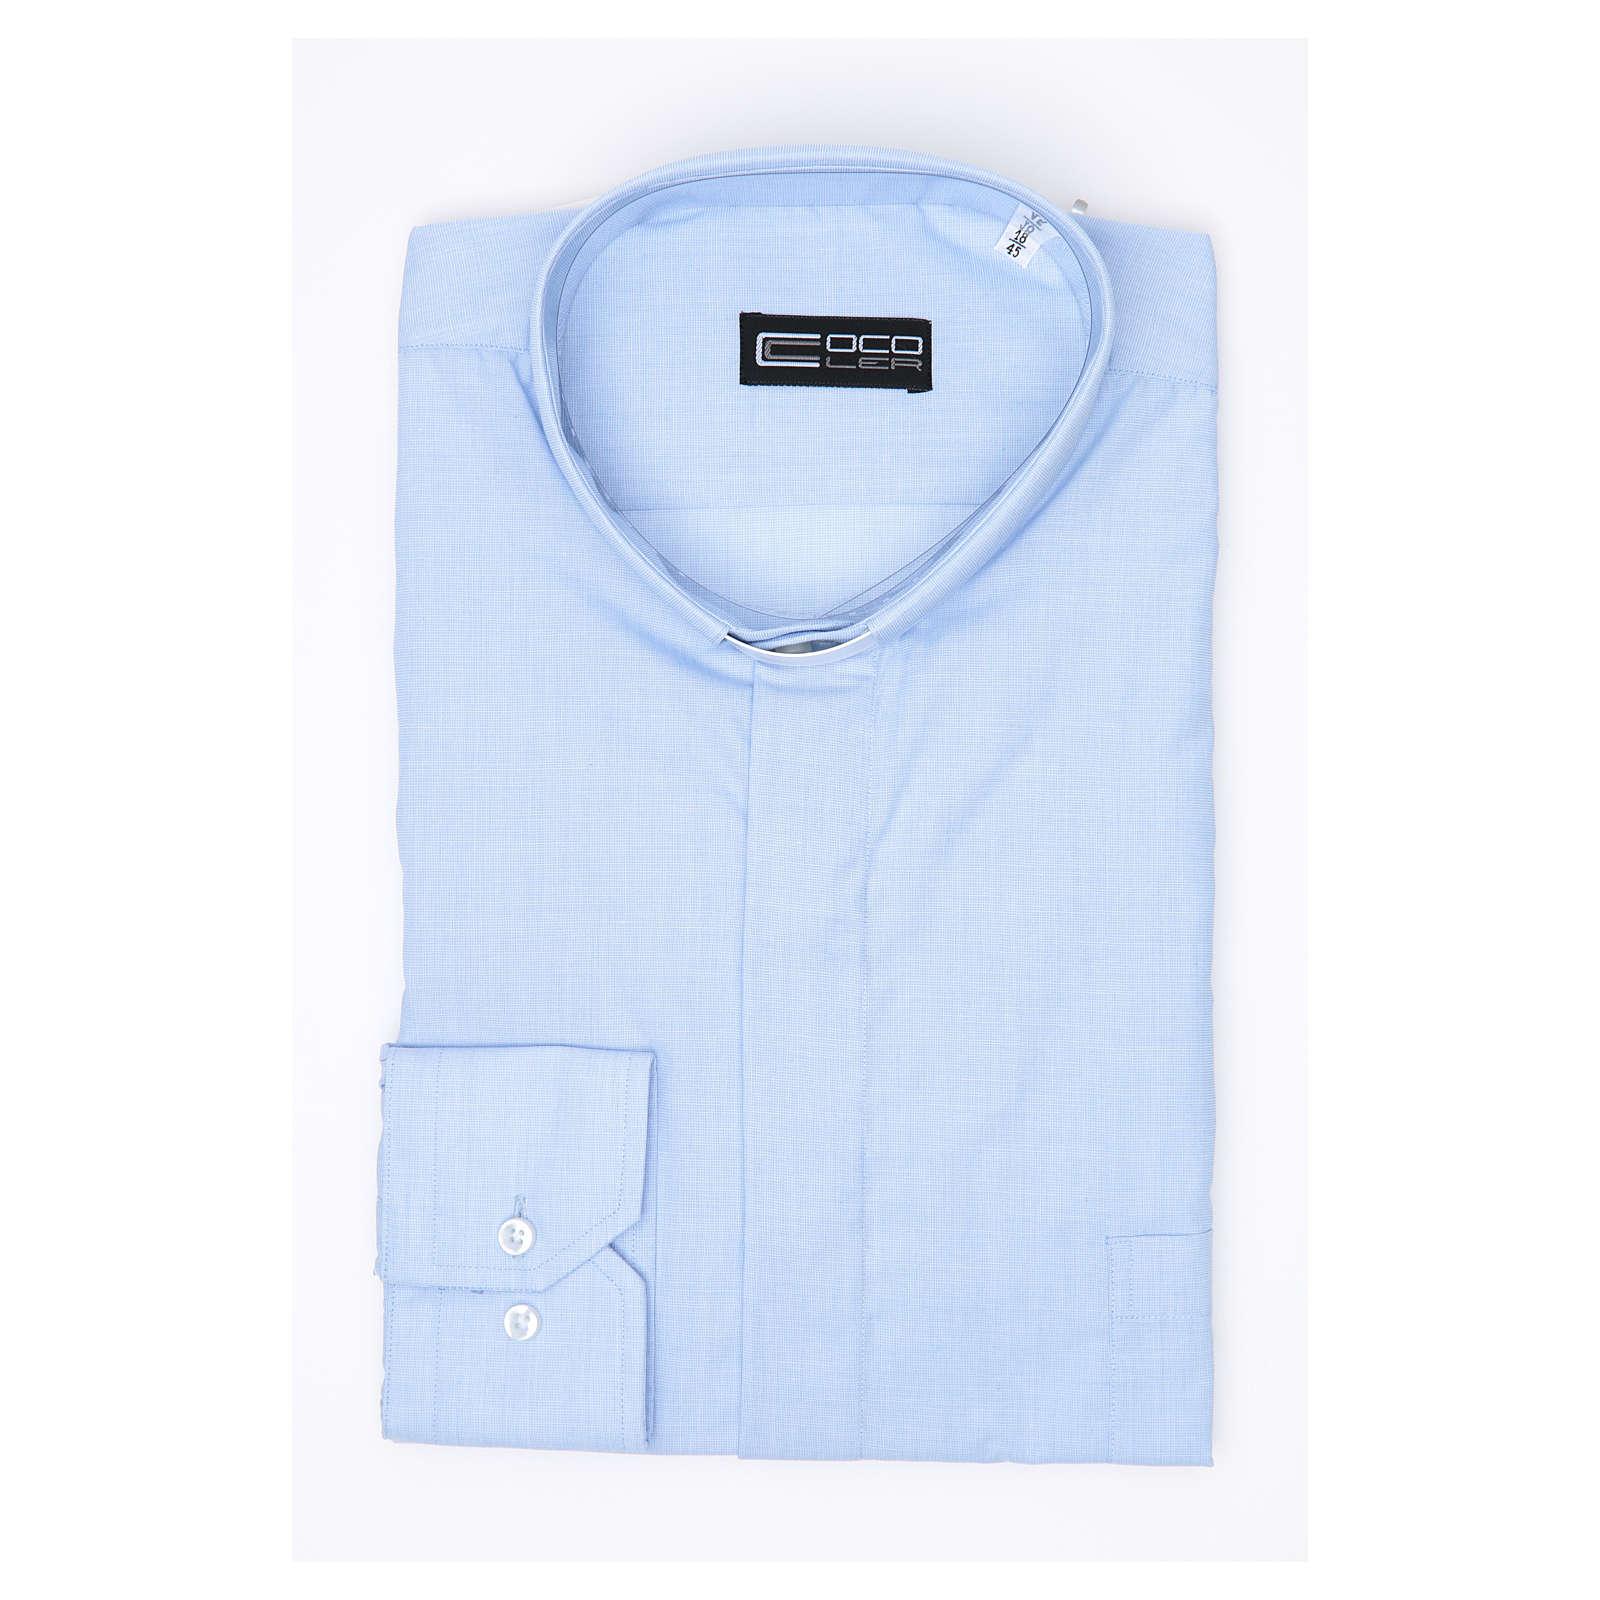 Clergy shirt long sleeves fil-à-fil mixed cotton Light Blue 4